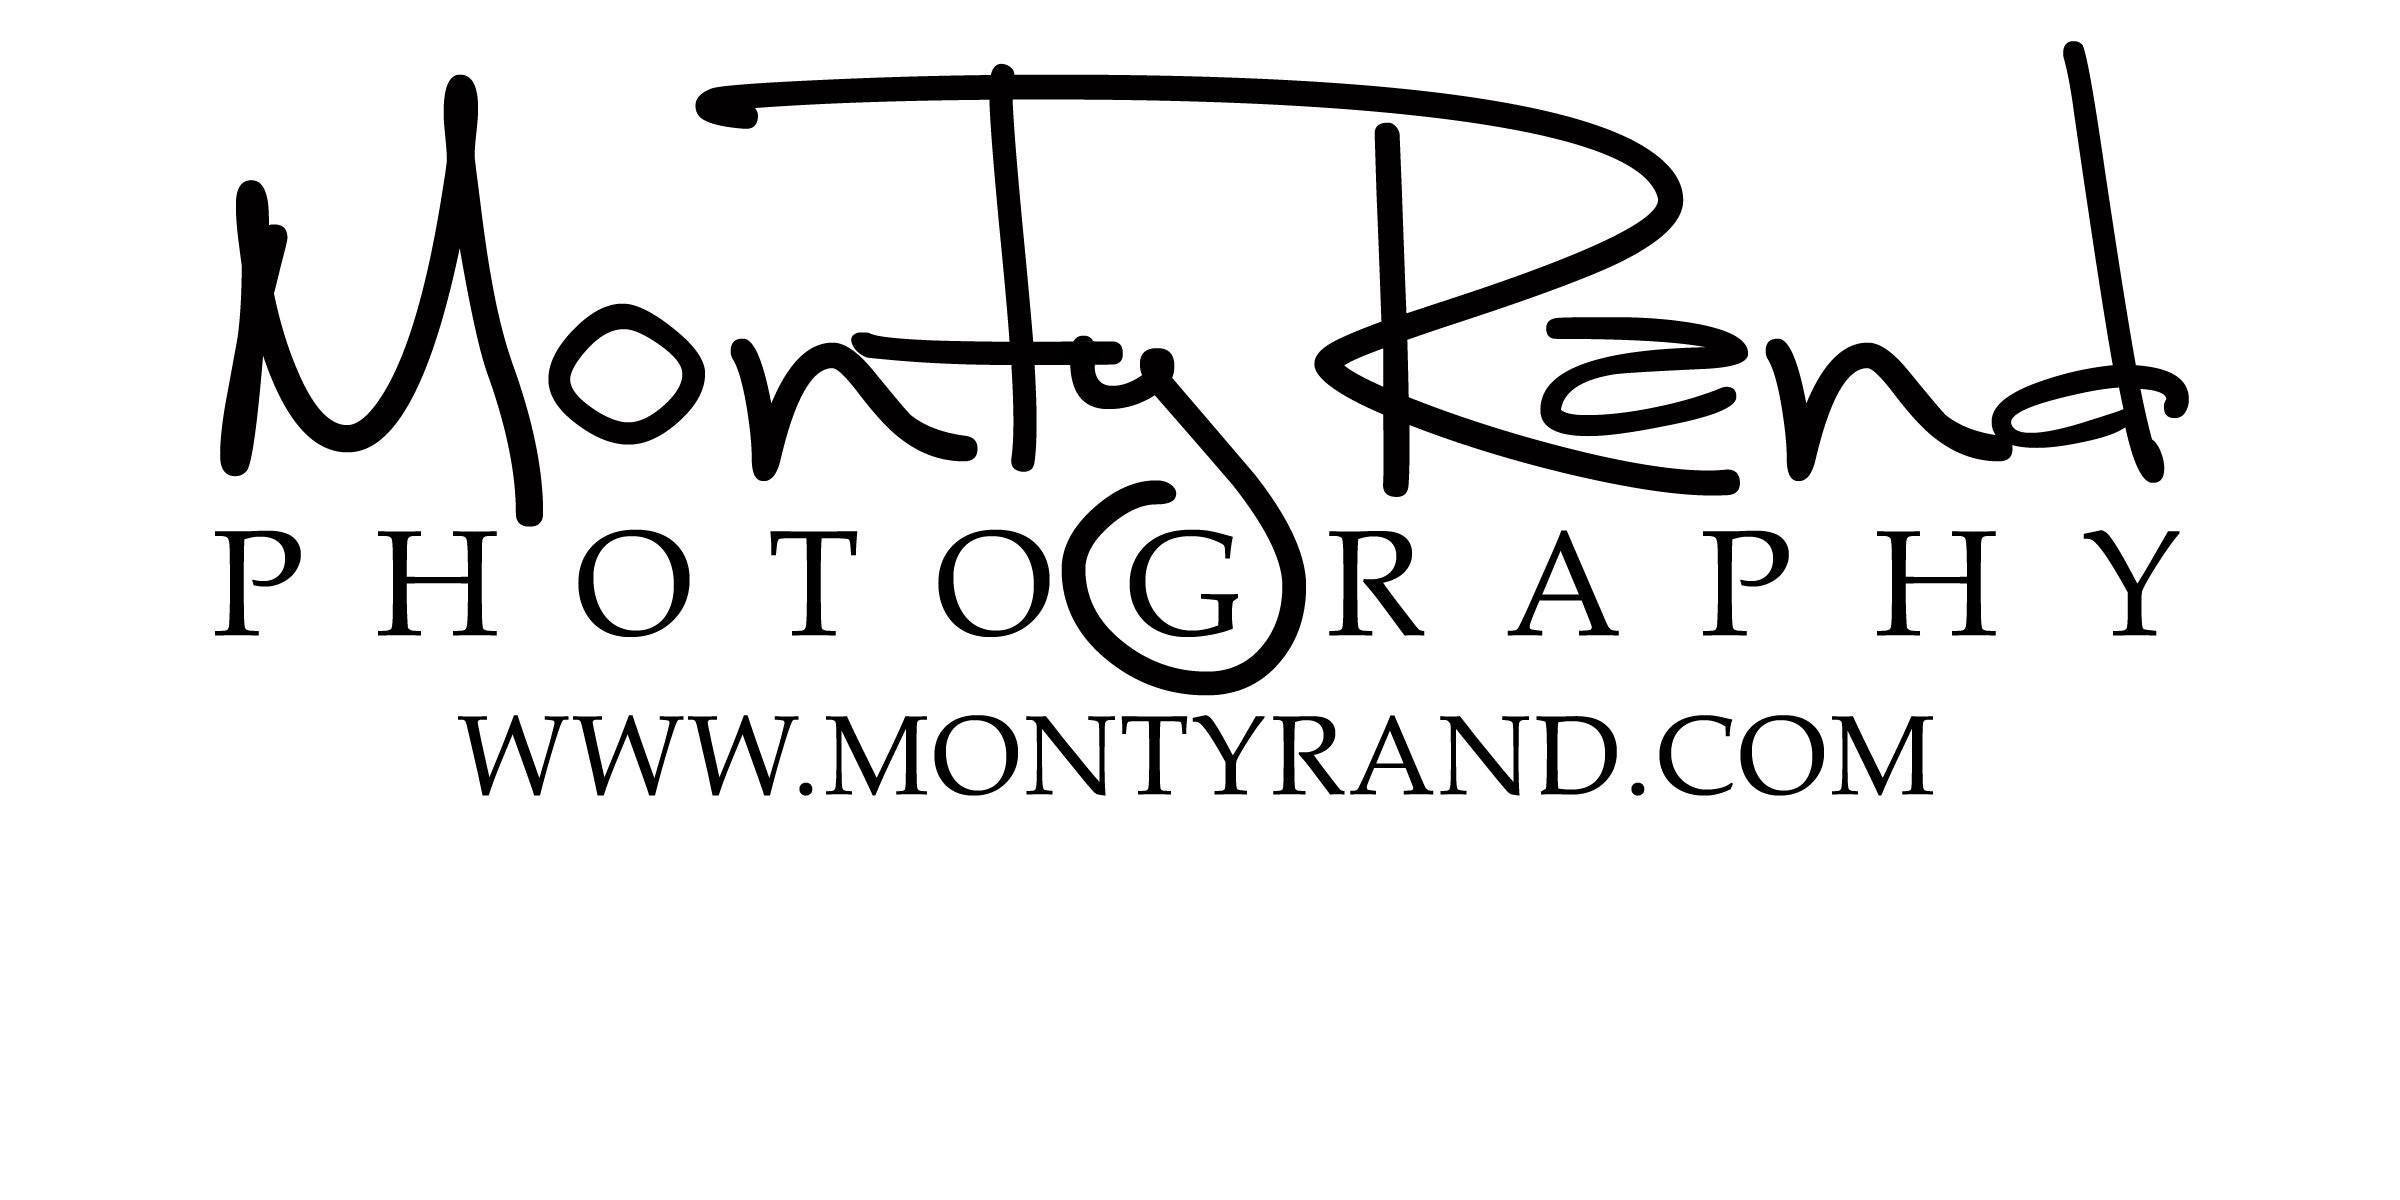 Monty Rand